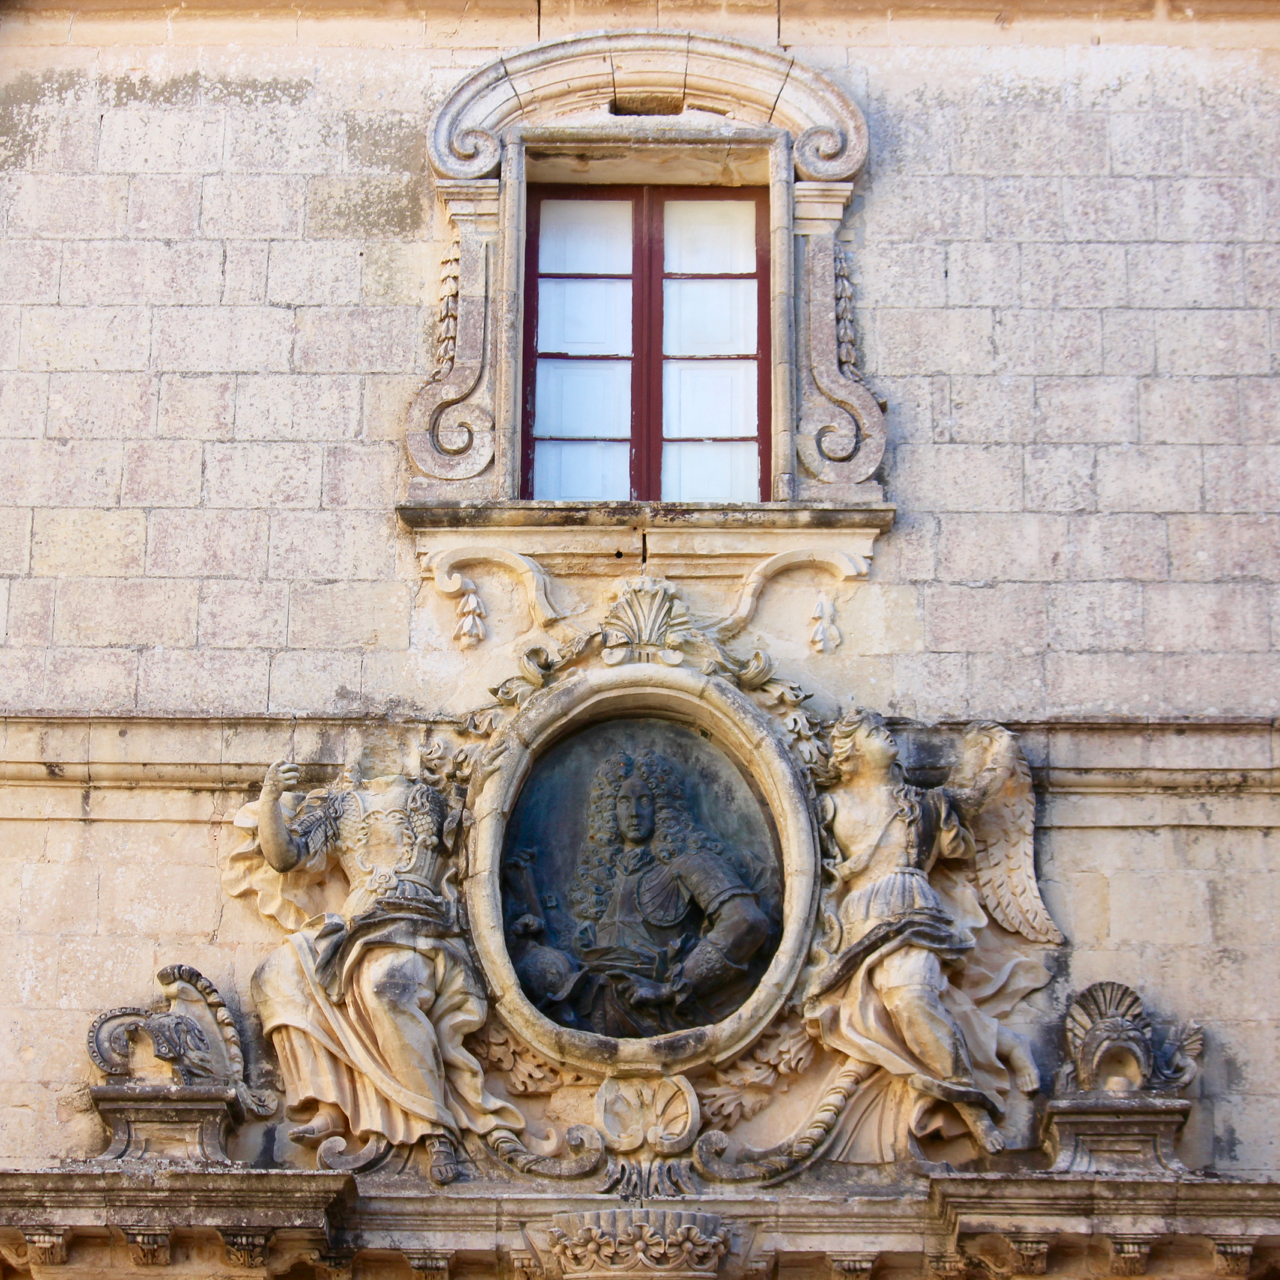 Mdina, Malta - 12